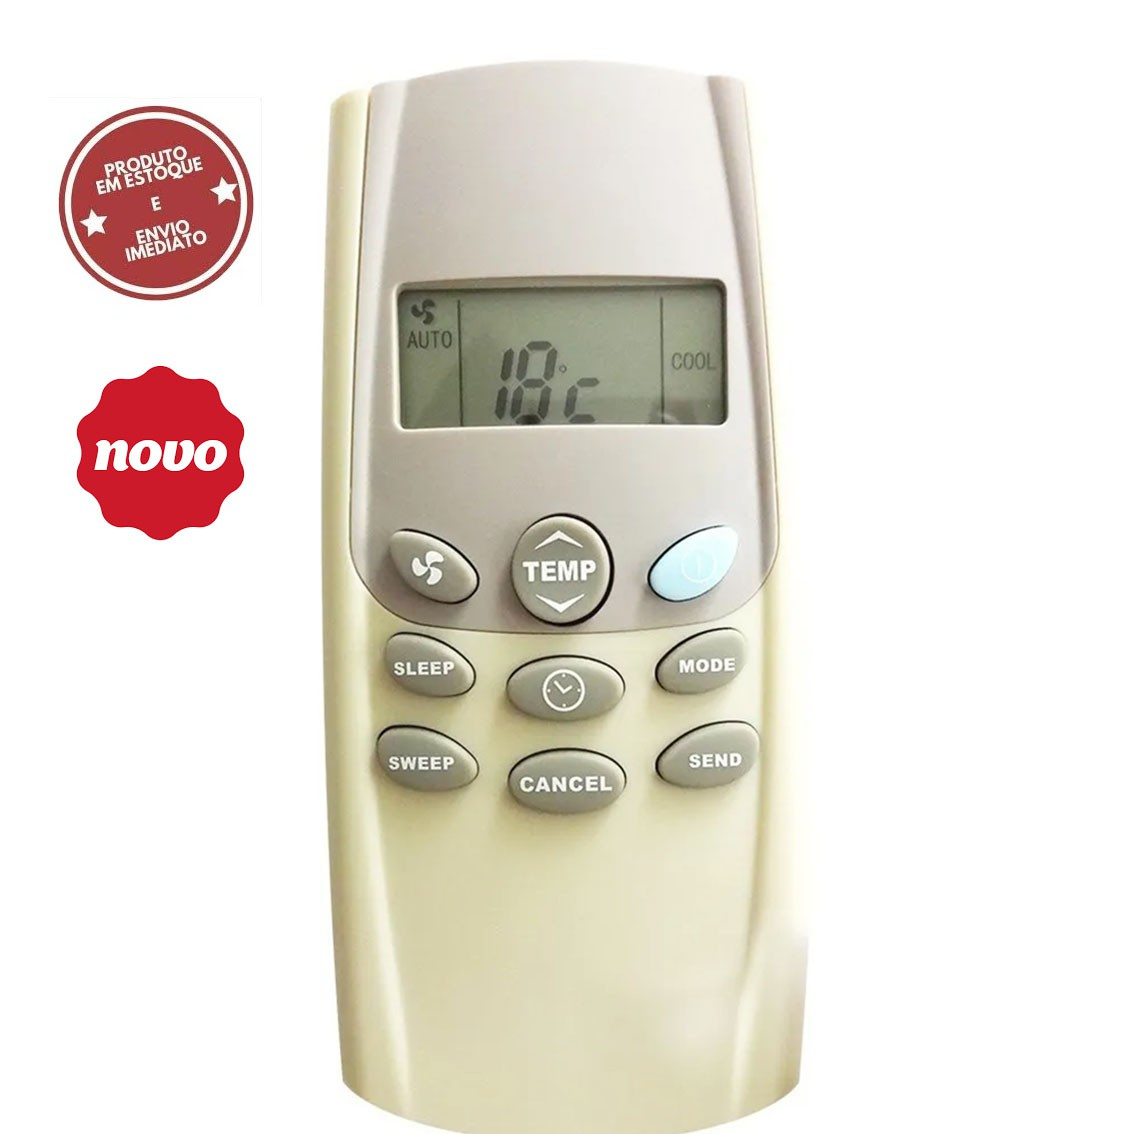 Controle Remoto Ar Condicionado Carrier 41014010 42XQB018515 42XQB018515LS